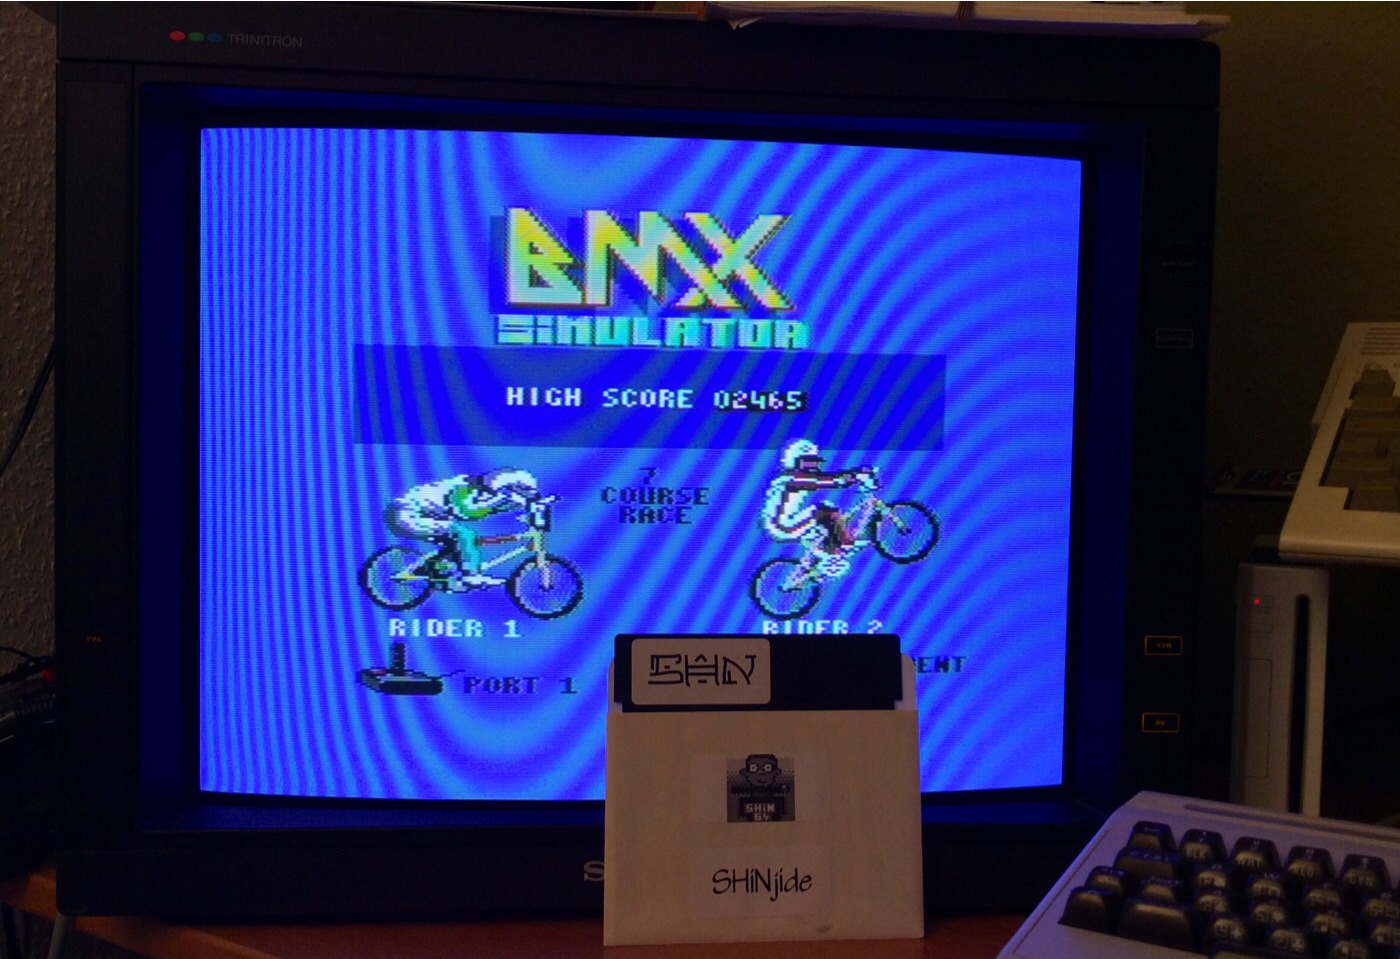 SHiNjide: BMX Simulator (Commodore 64) 2,465 points on 2014-11-27 12:59:59